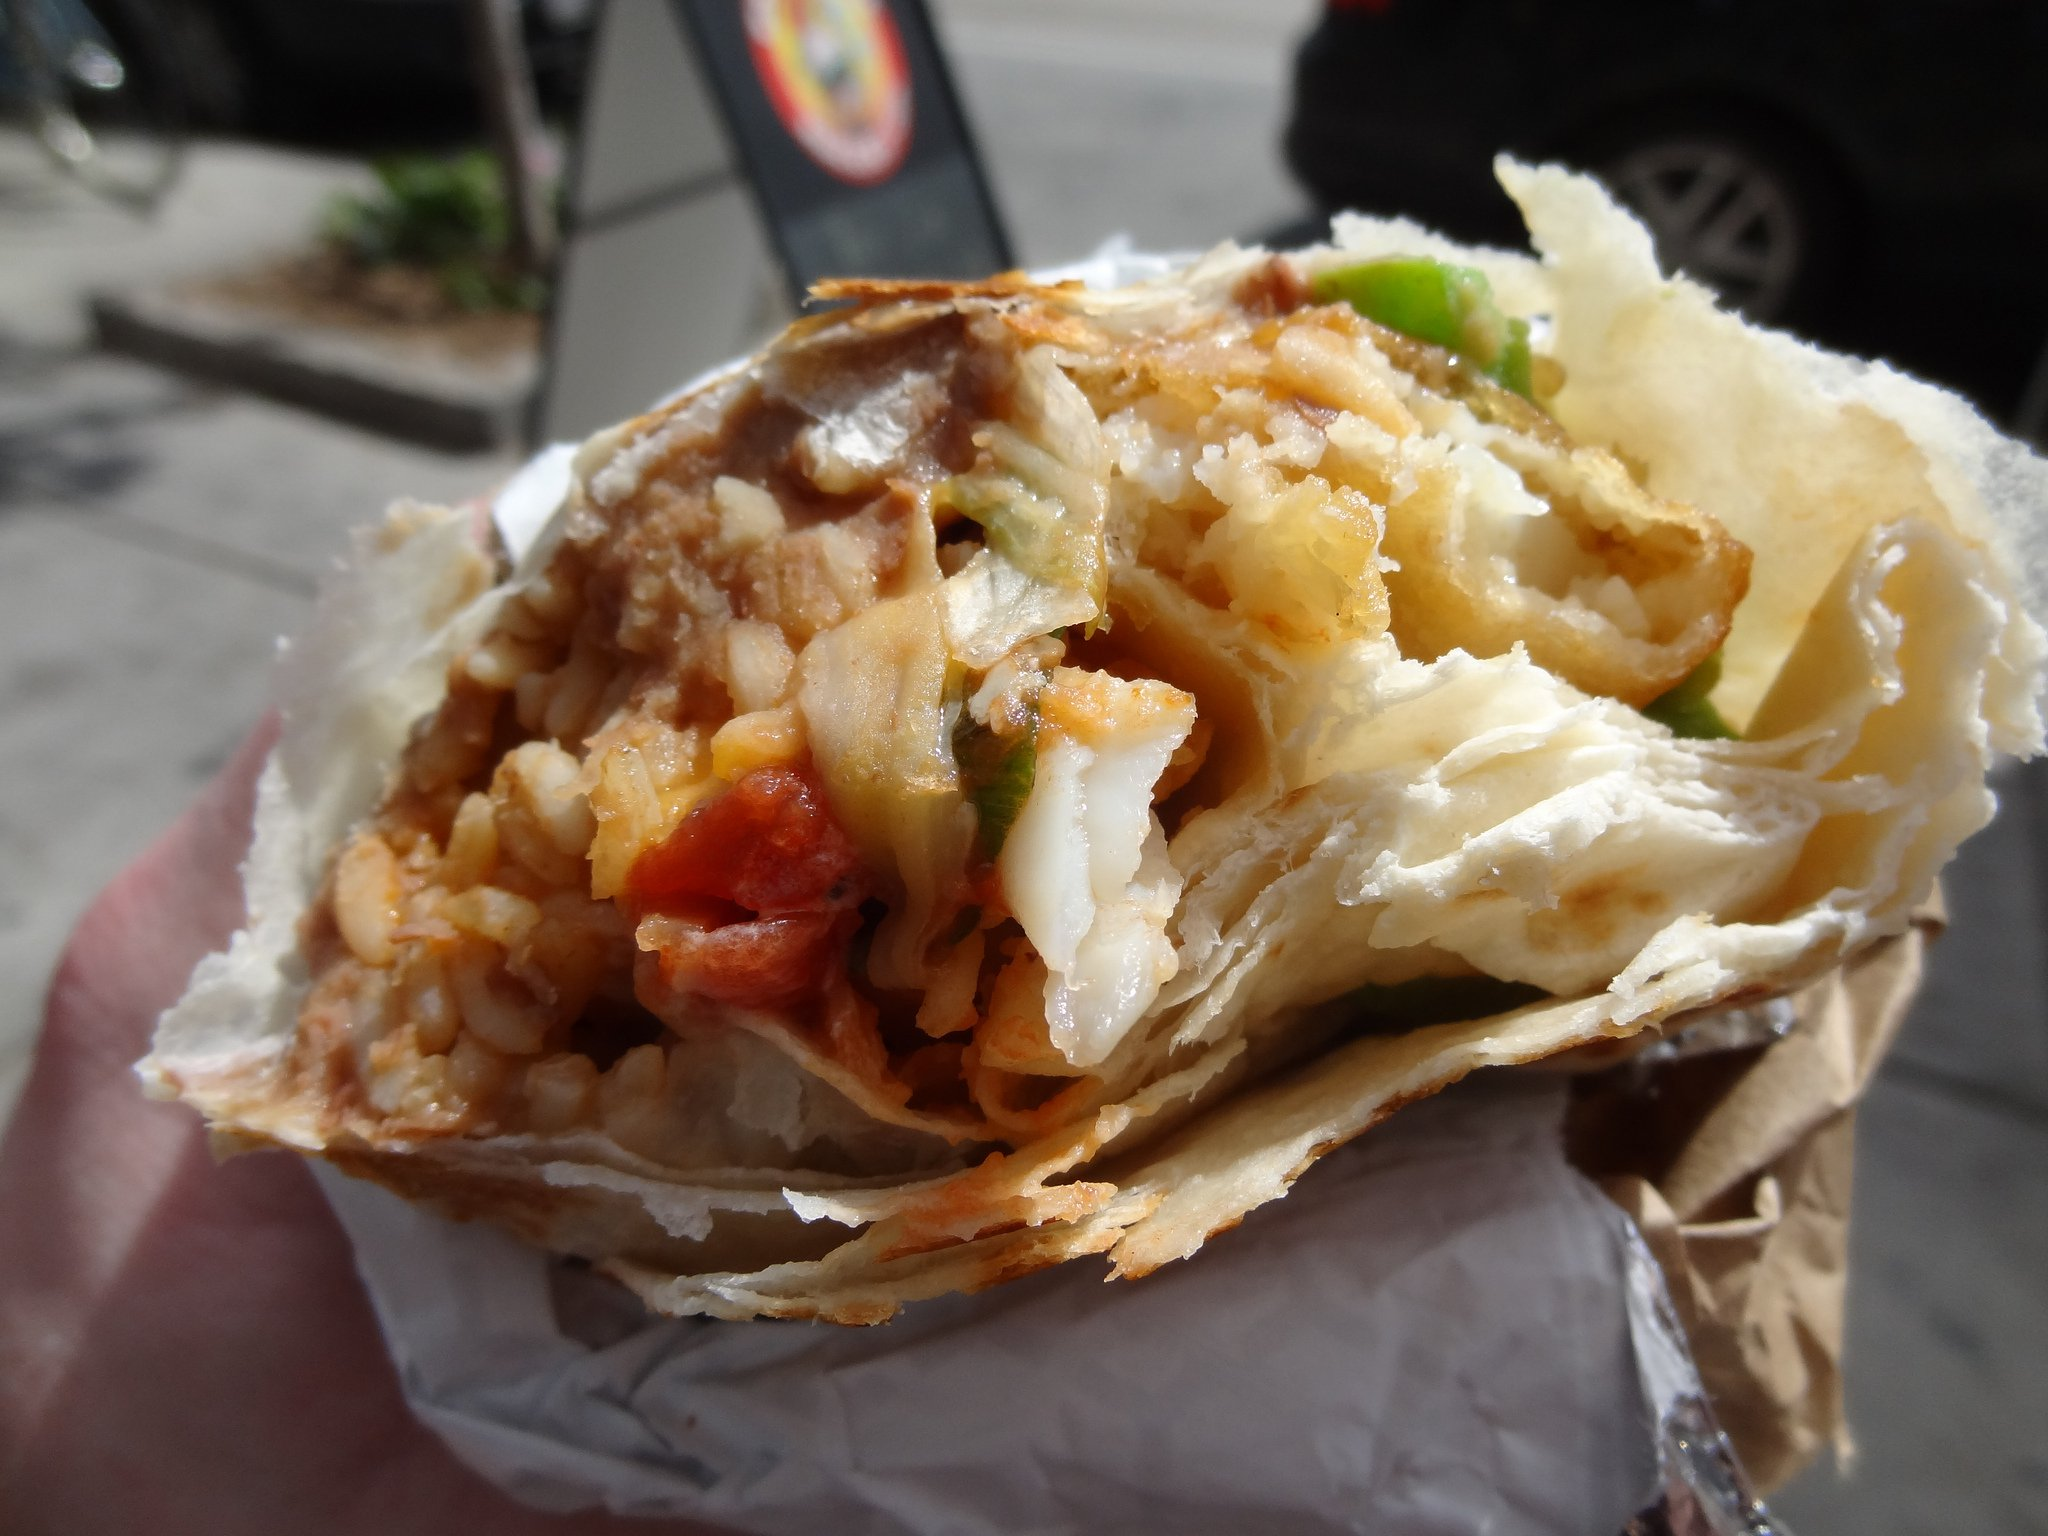 Bolet's burrito Toronto food